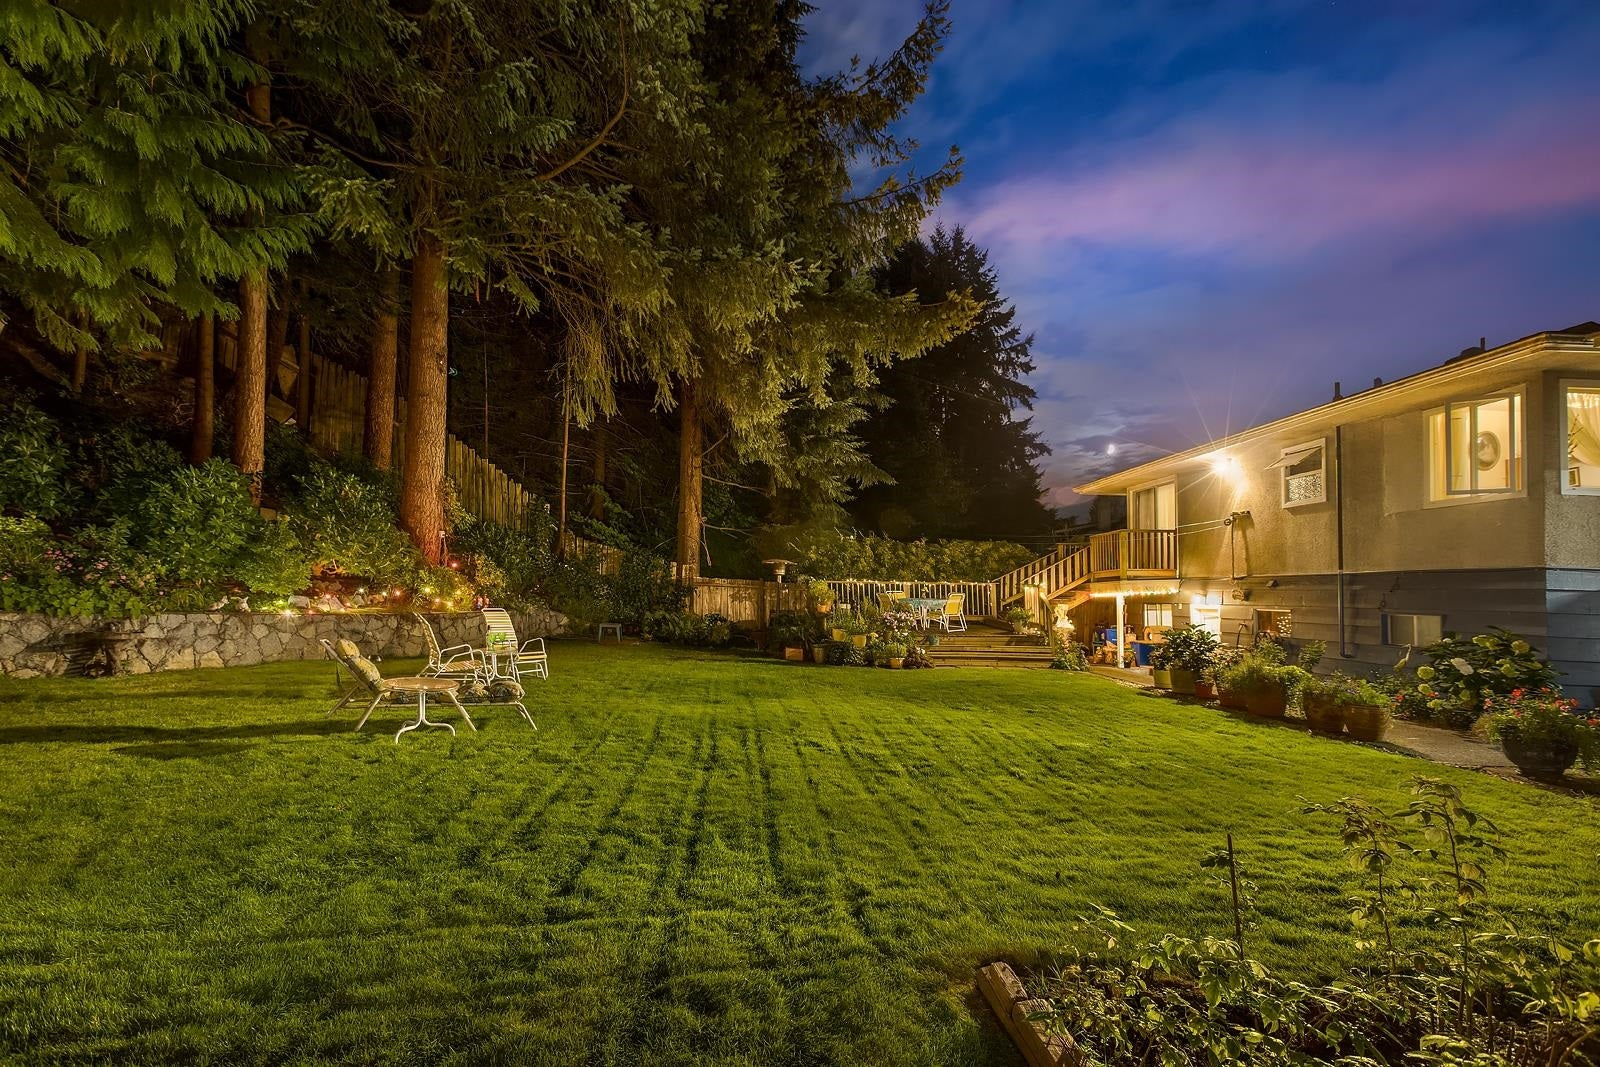 3495 WELLINGTON CRESCENT - Edgemont House/Single Family for sale, 3 Bedrooms (R2617949) - #17